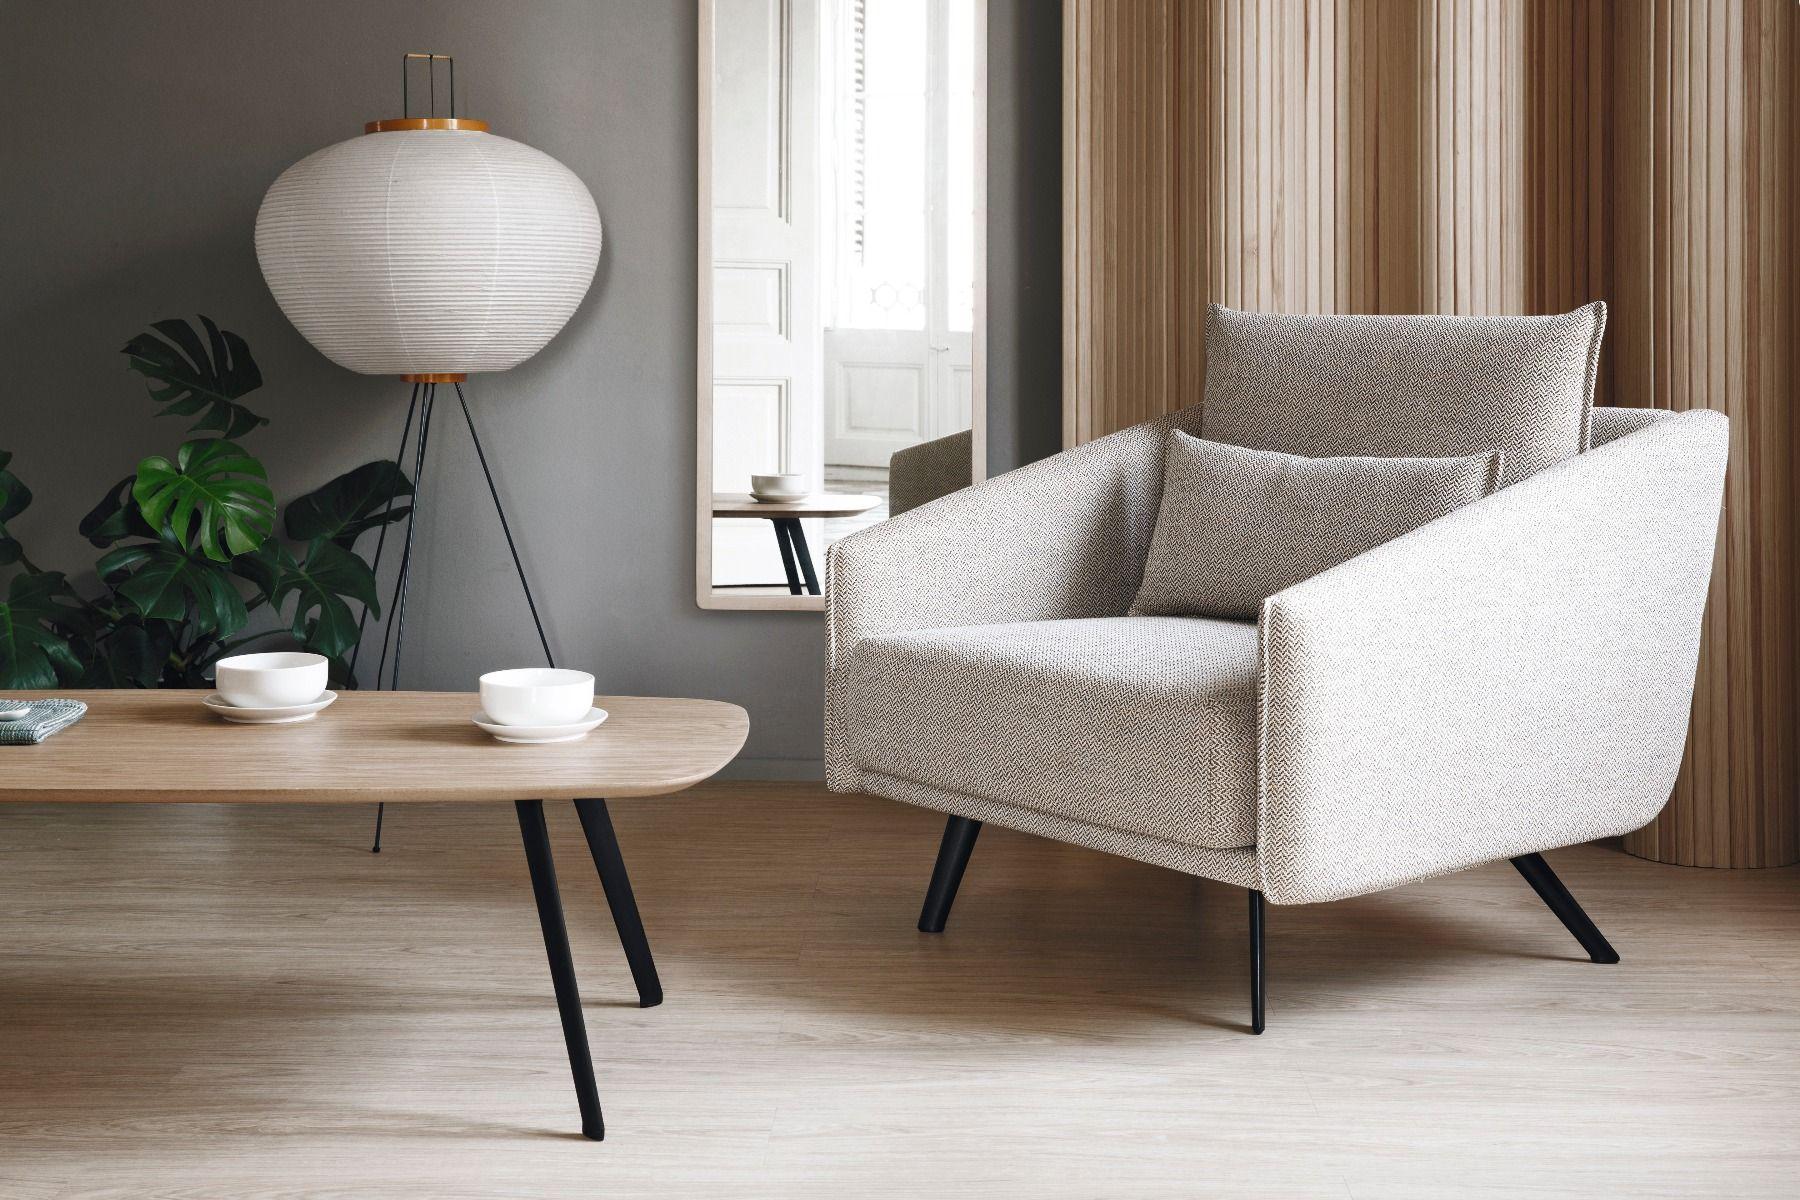 STUA Costura arm chair, with oak solapa coffee table